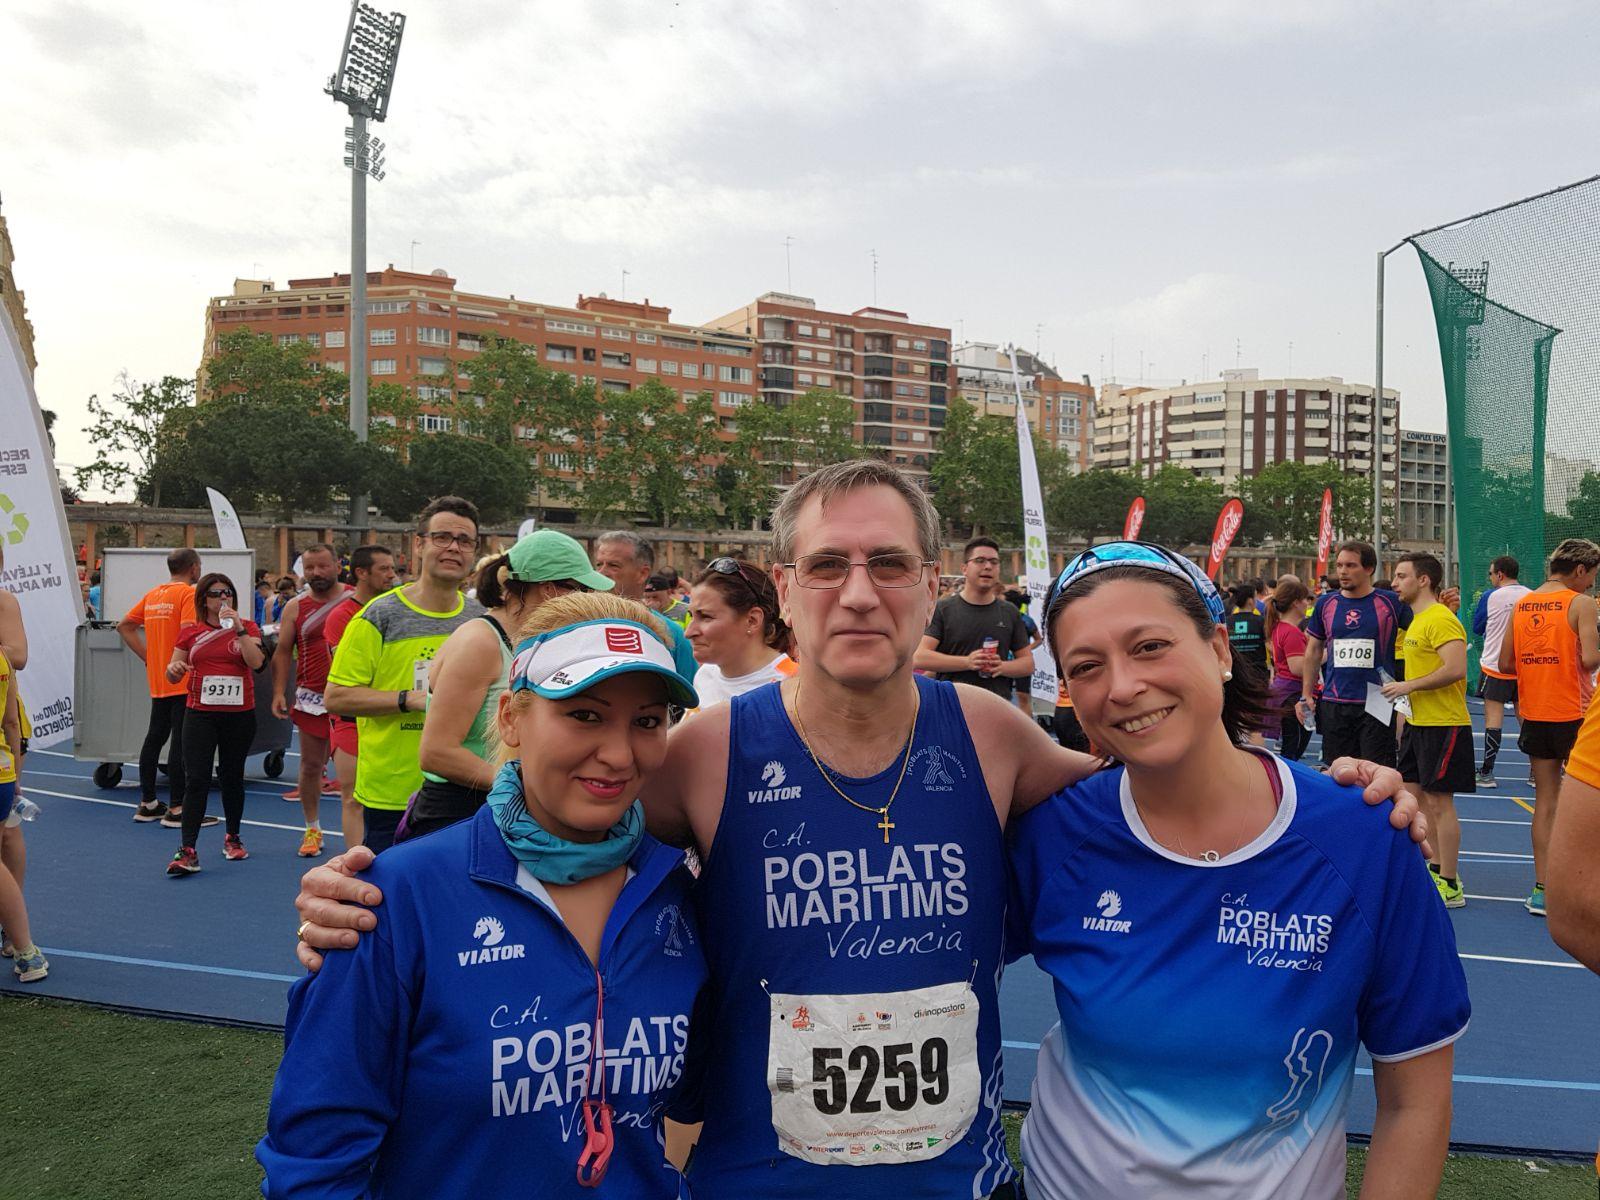 V Carrera Jose Antonio Redolat